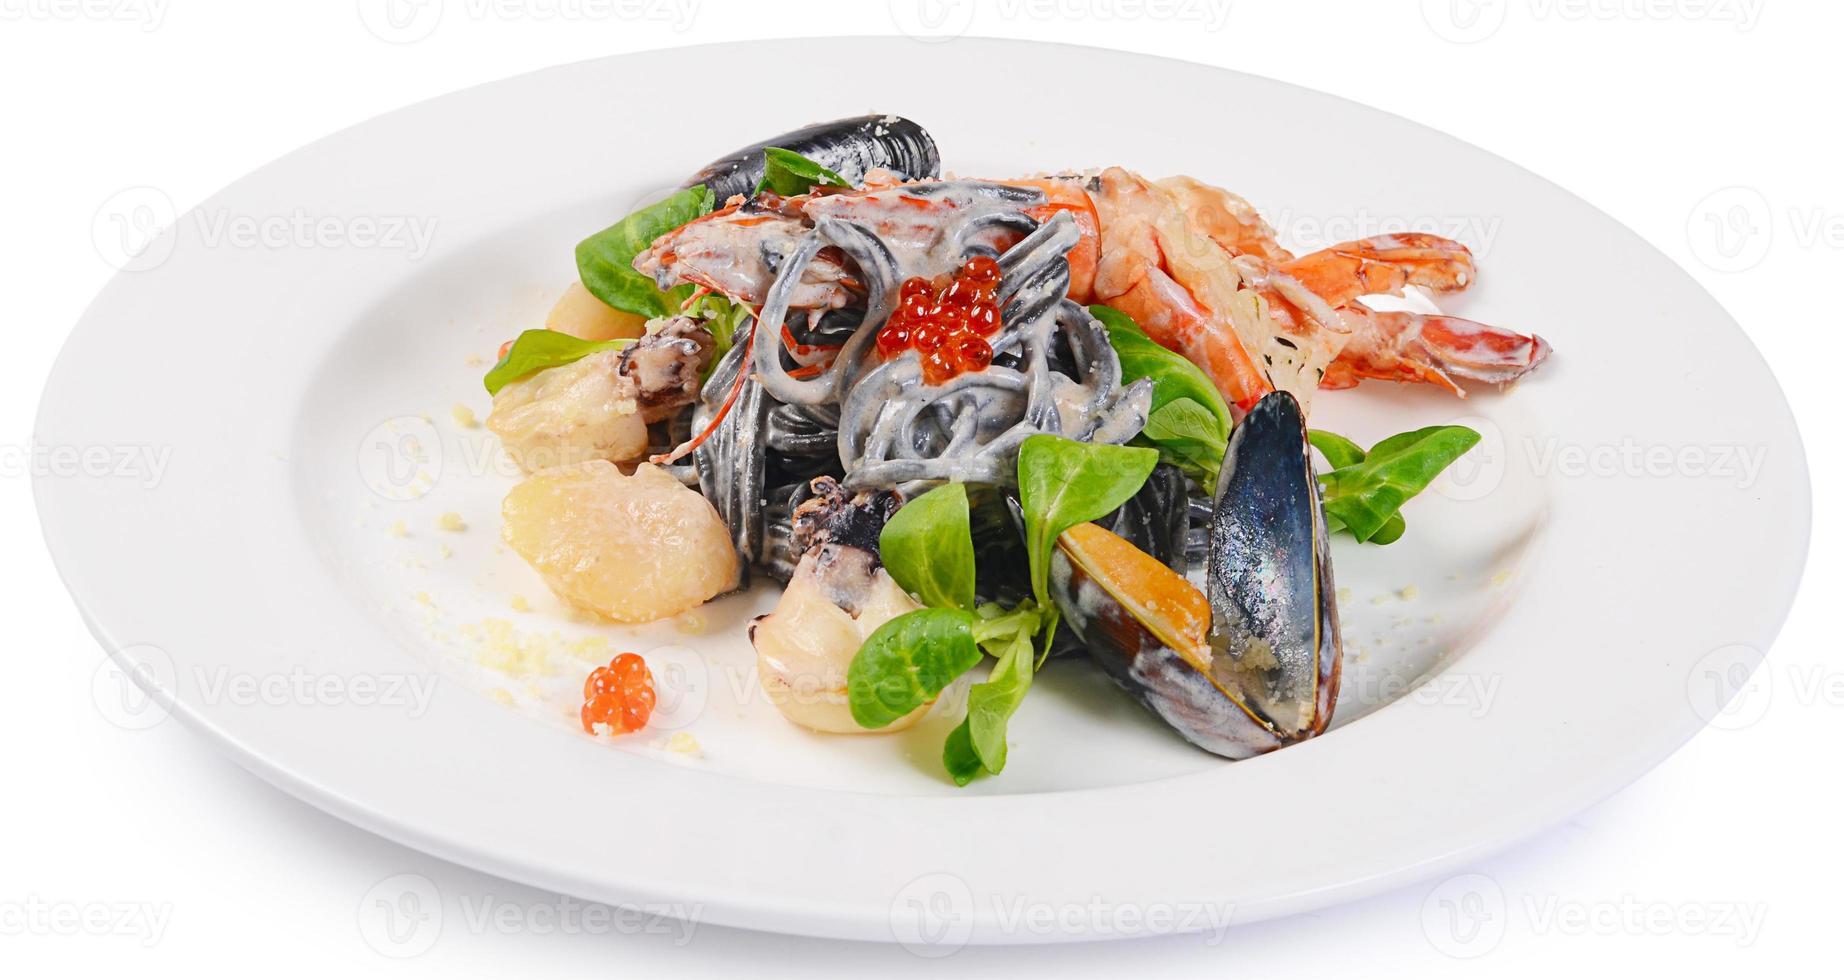 les spaghettis noirs avec gros plan de fruits de mer photo